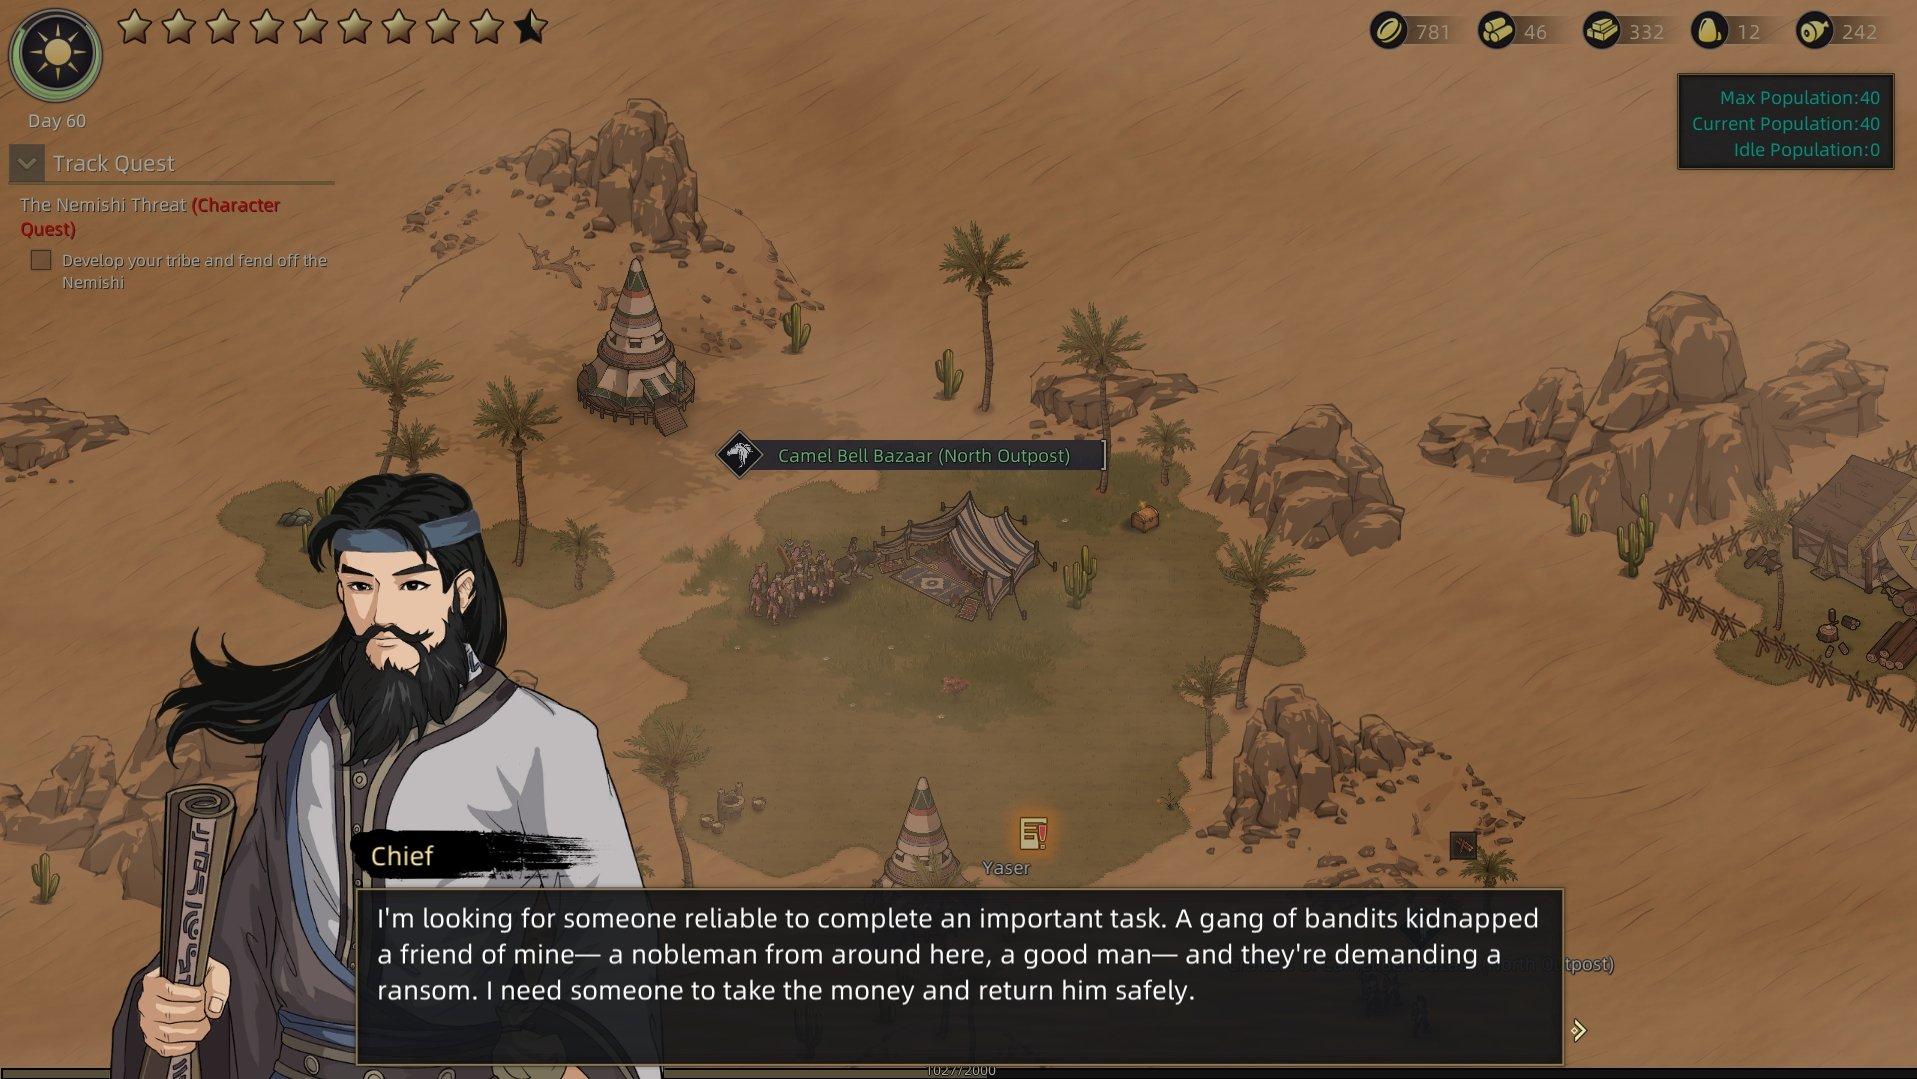 Sands of Salzaar - How to Make Money Kidnapping